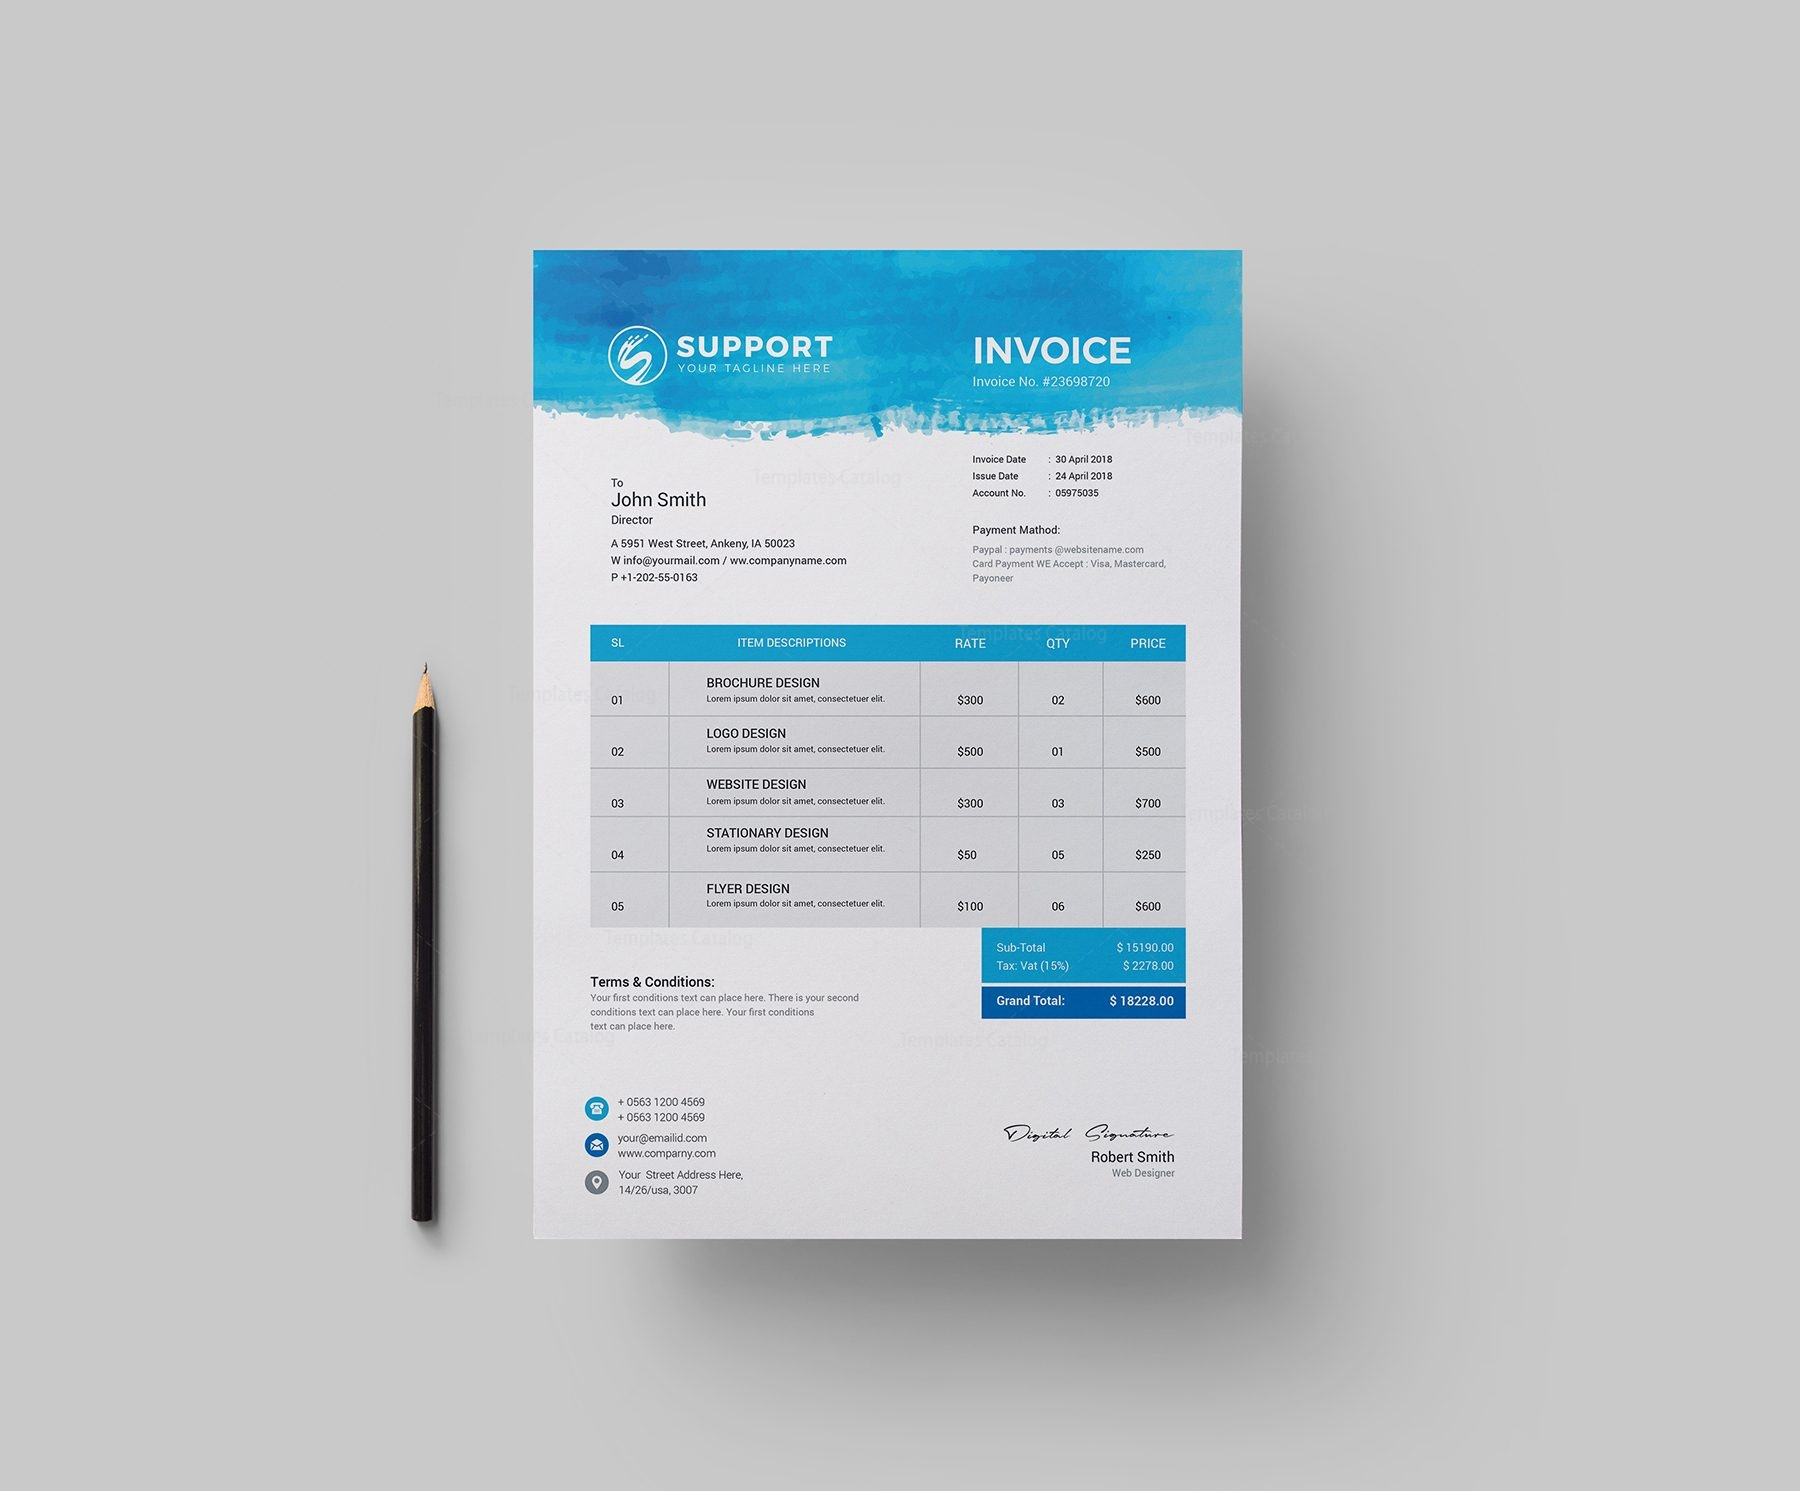 Serenity Corporate Invoice Design Template 002153 Template Catalog